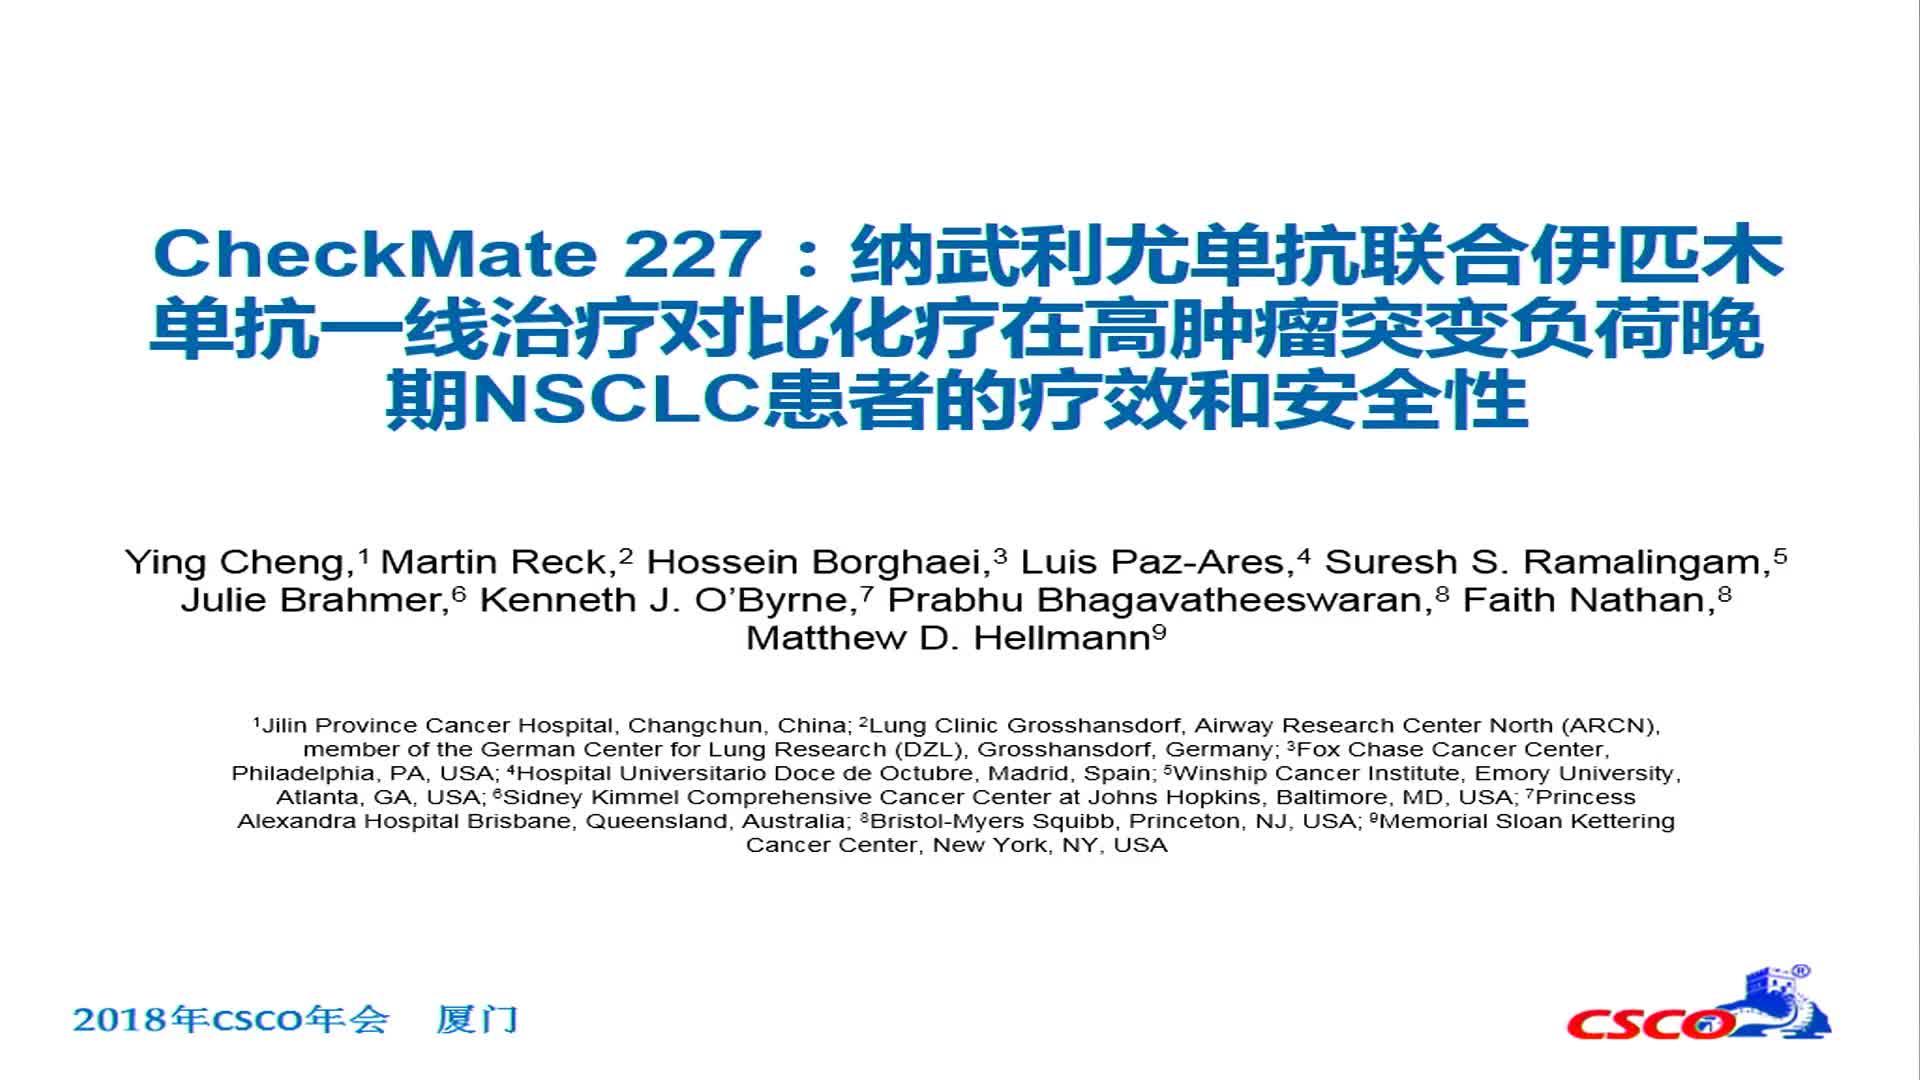 CheckMate 227:纳武利尤单抗联合伊匹木单抗一线治疗对比化疗在高肿瘤突变负荷晚期NSCLC患者的疗效和安全性